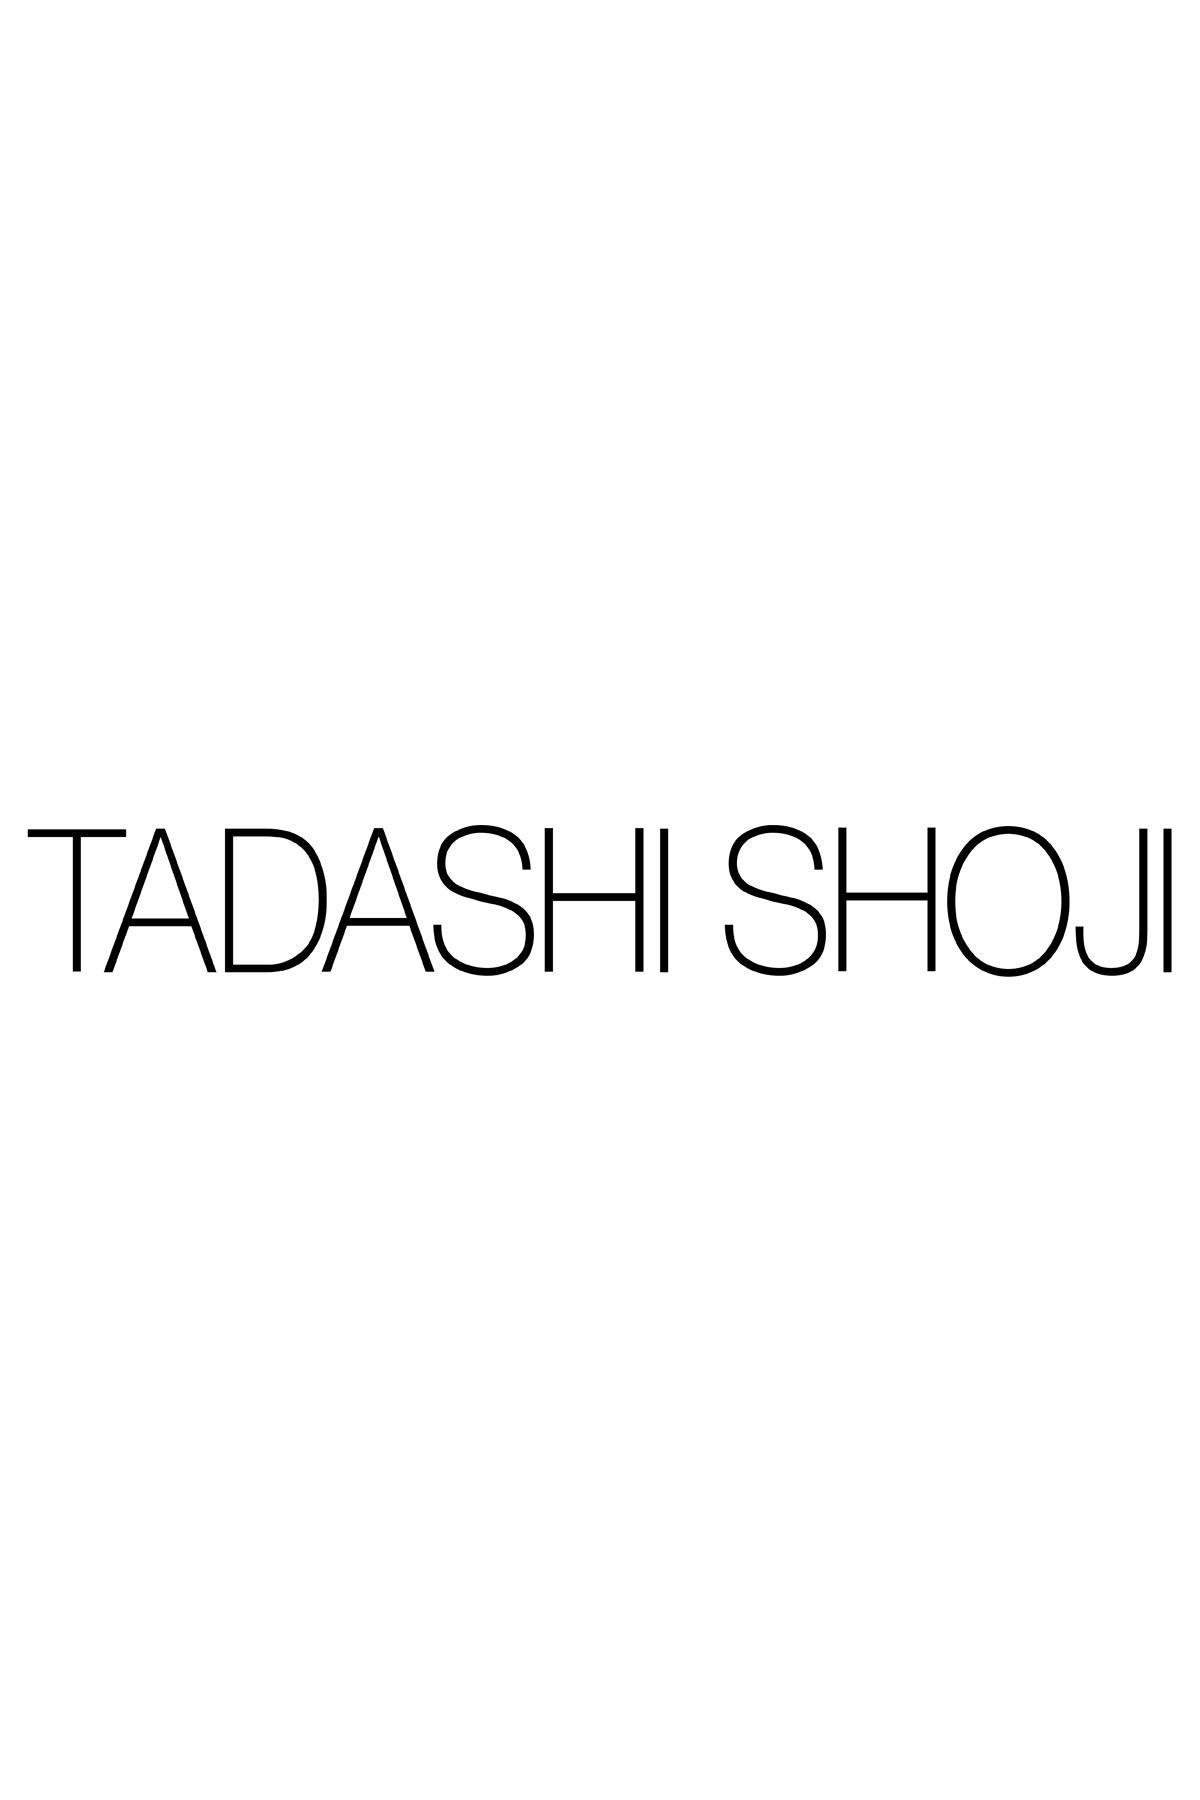 Tadashi Shoji - Calypso Sequin Slit Gown